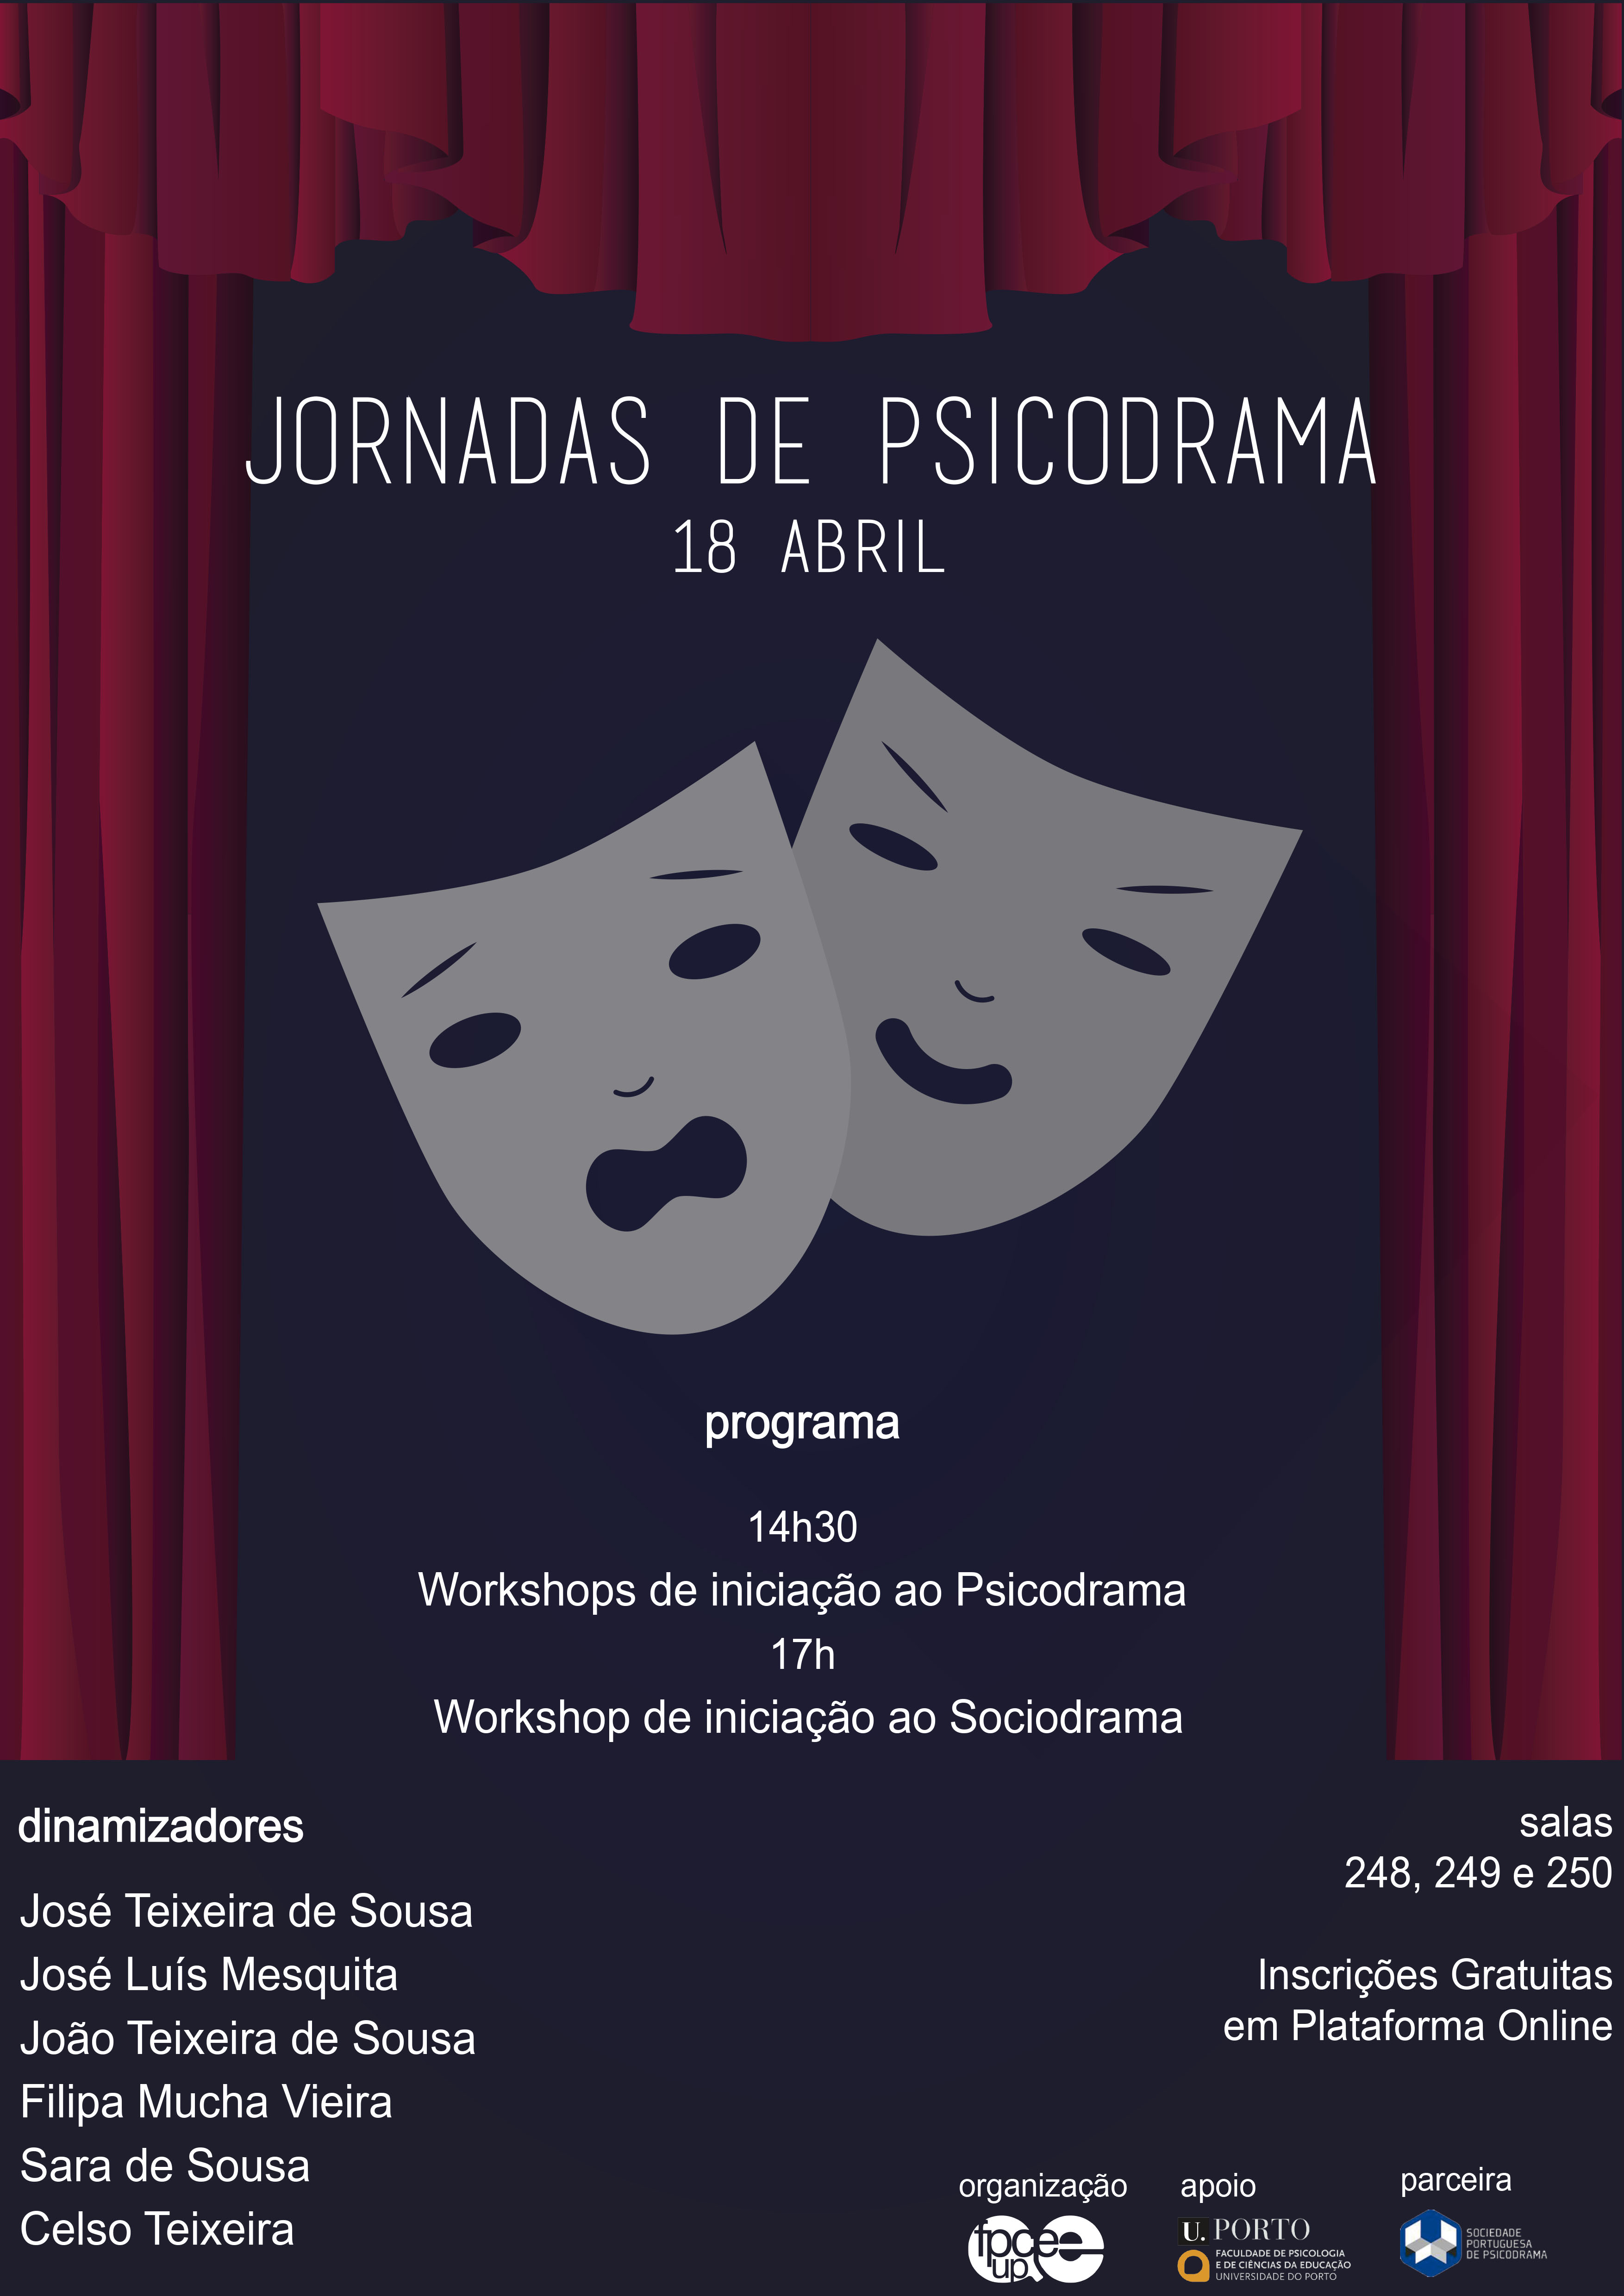 Jornadas de Psicodrama